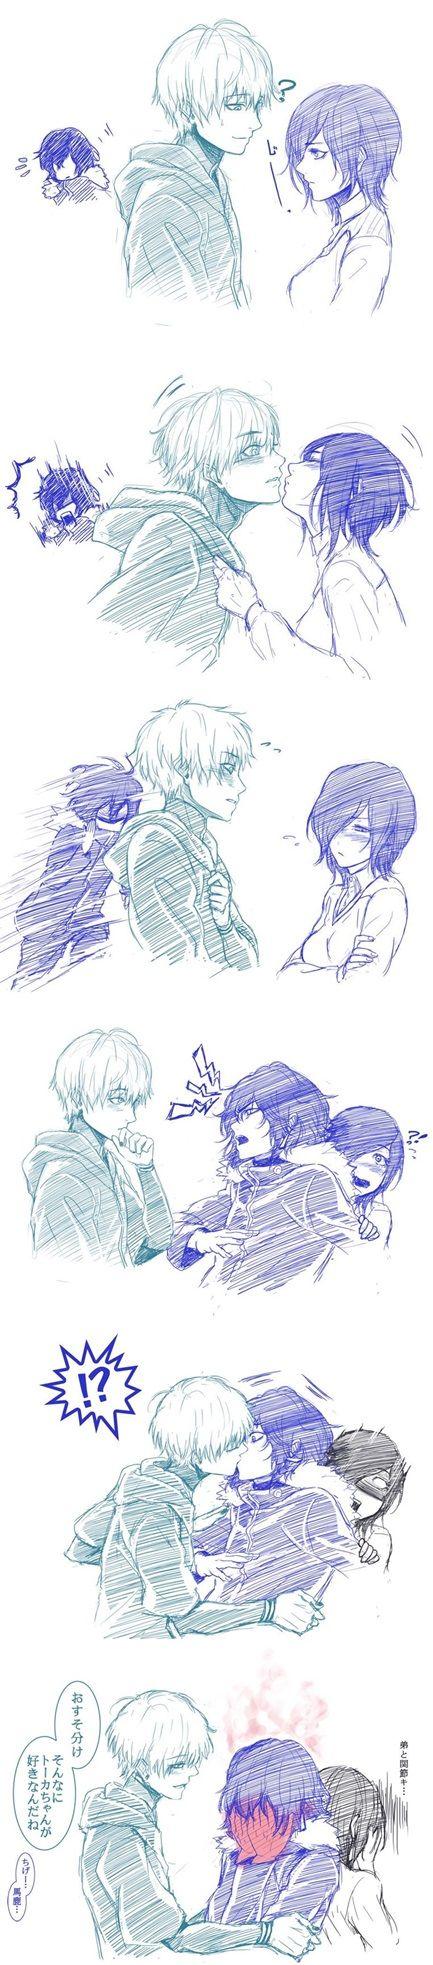 Tokyo Ghoul | Kaneki x Ayato (and Touka) | yaoi | kiss | cute *----* | Should I ship Kaneki with Ayato? xdd :3 AWE!!!// pins for 8 years